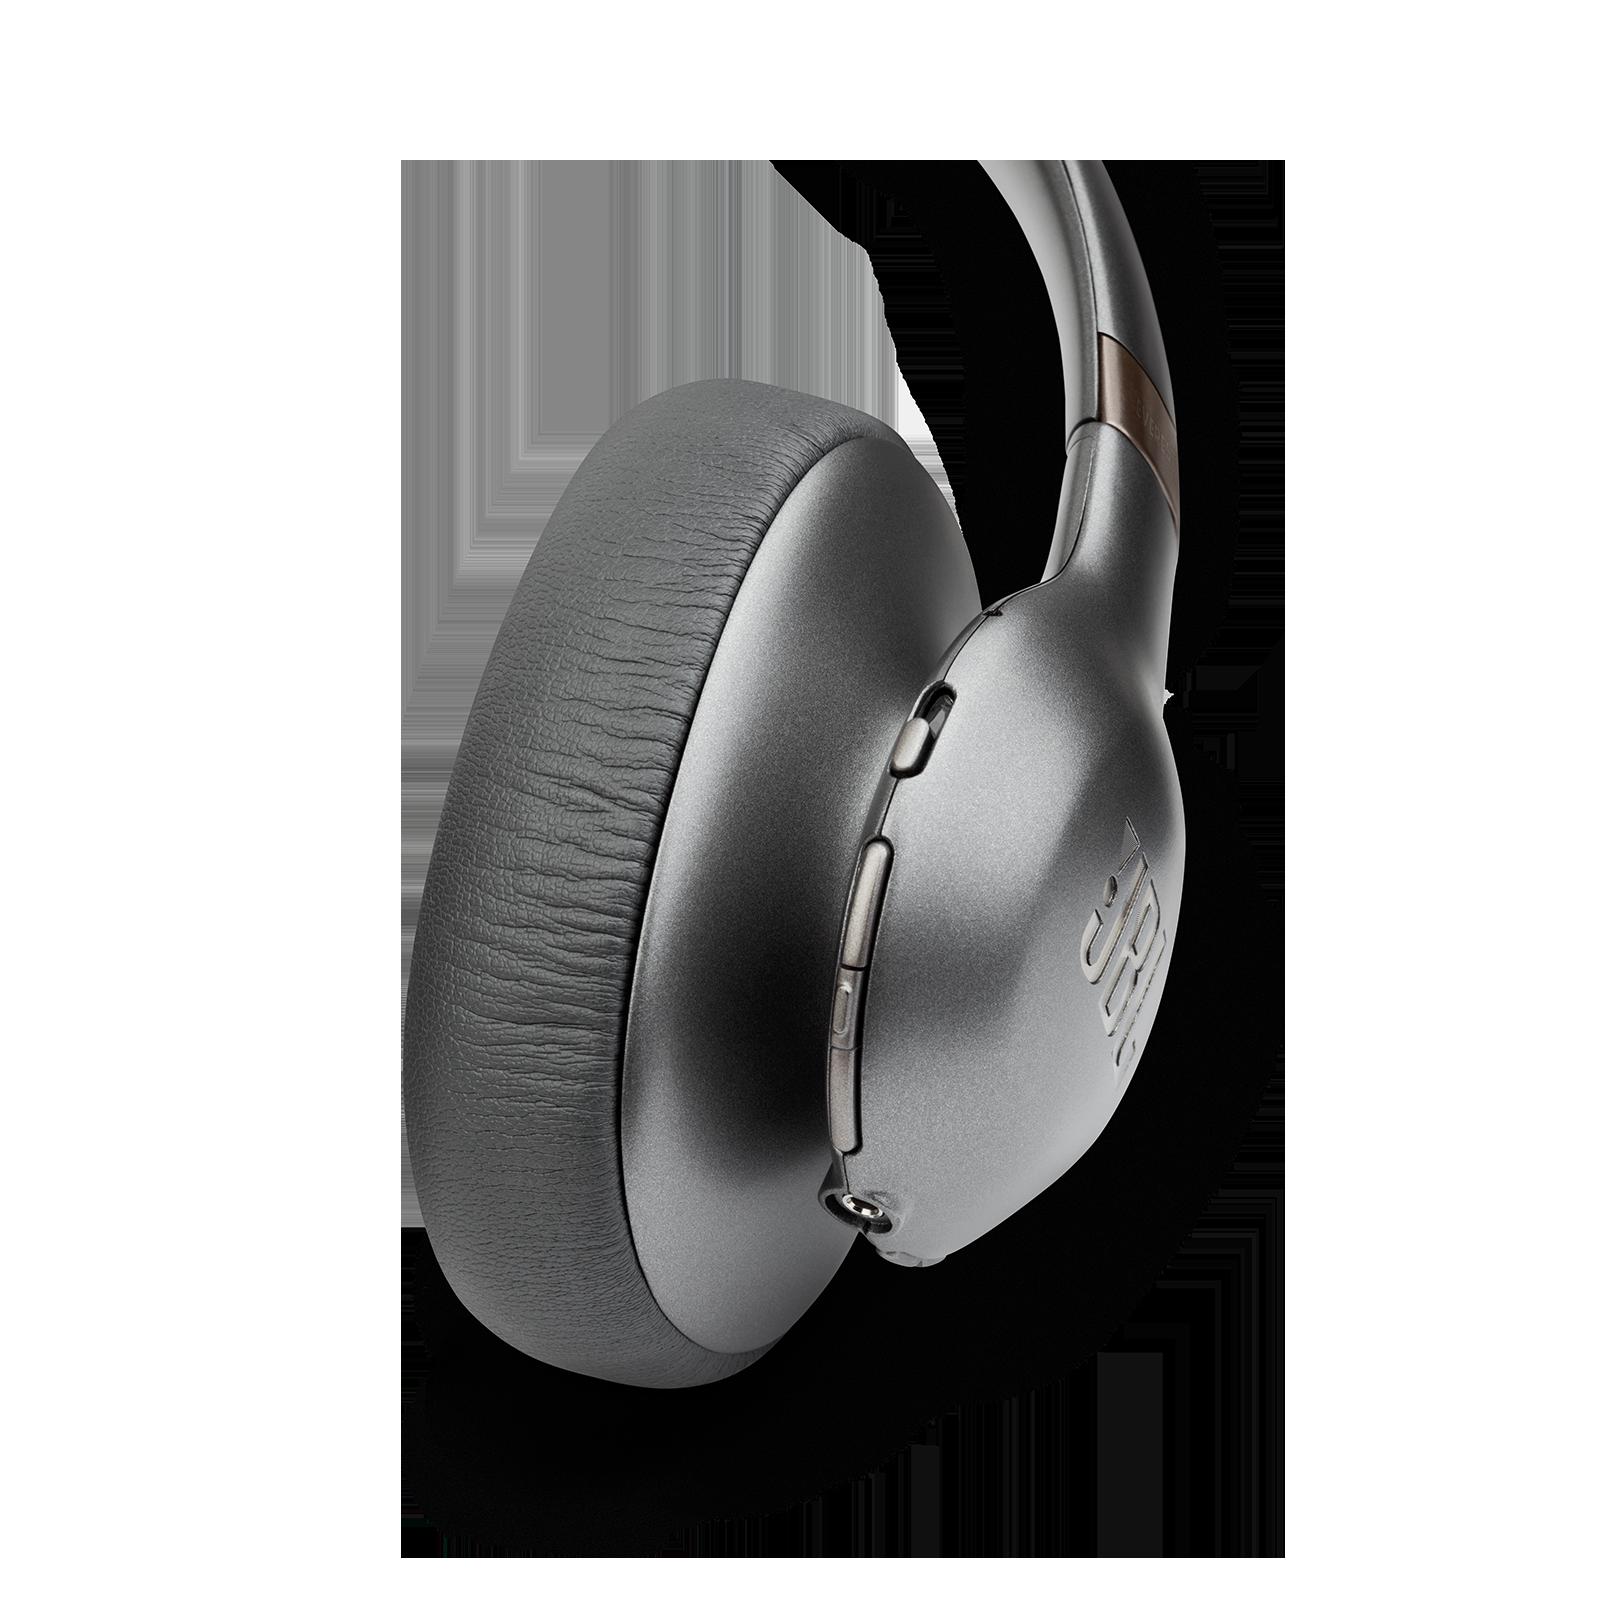 JBL EVEREST™ ELITE 750NC - Gun Metal - Wireless Over-Ear Adaptive Noise Cancelling headphones - Detailshot 2